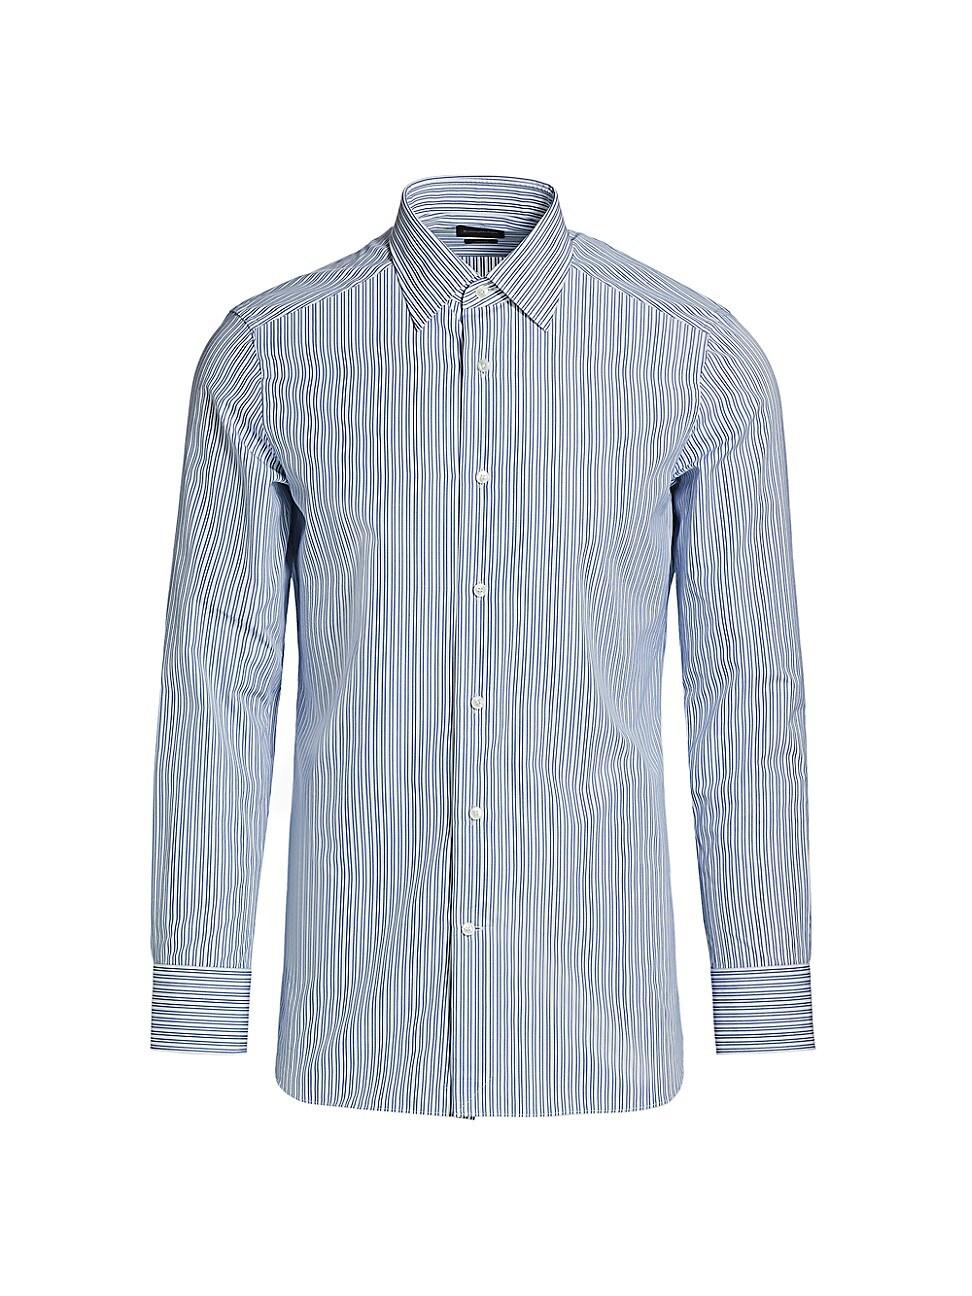 Ermenegildo Zegna Trofeo Striped Sport Shirt In Blue